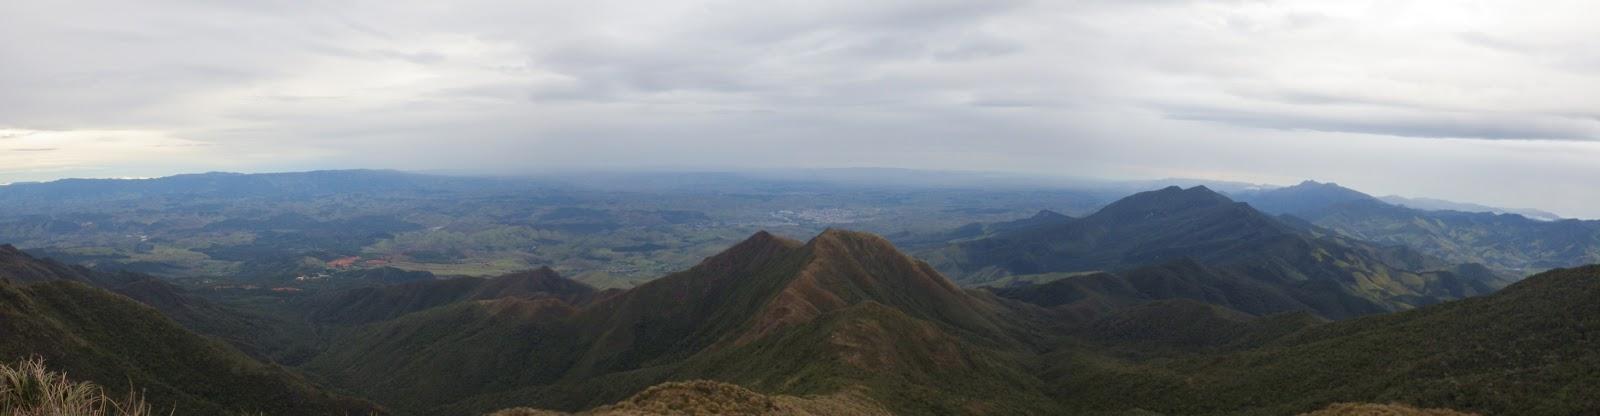 Vista panorâmica do cume do Capim Amarelo